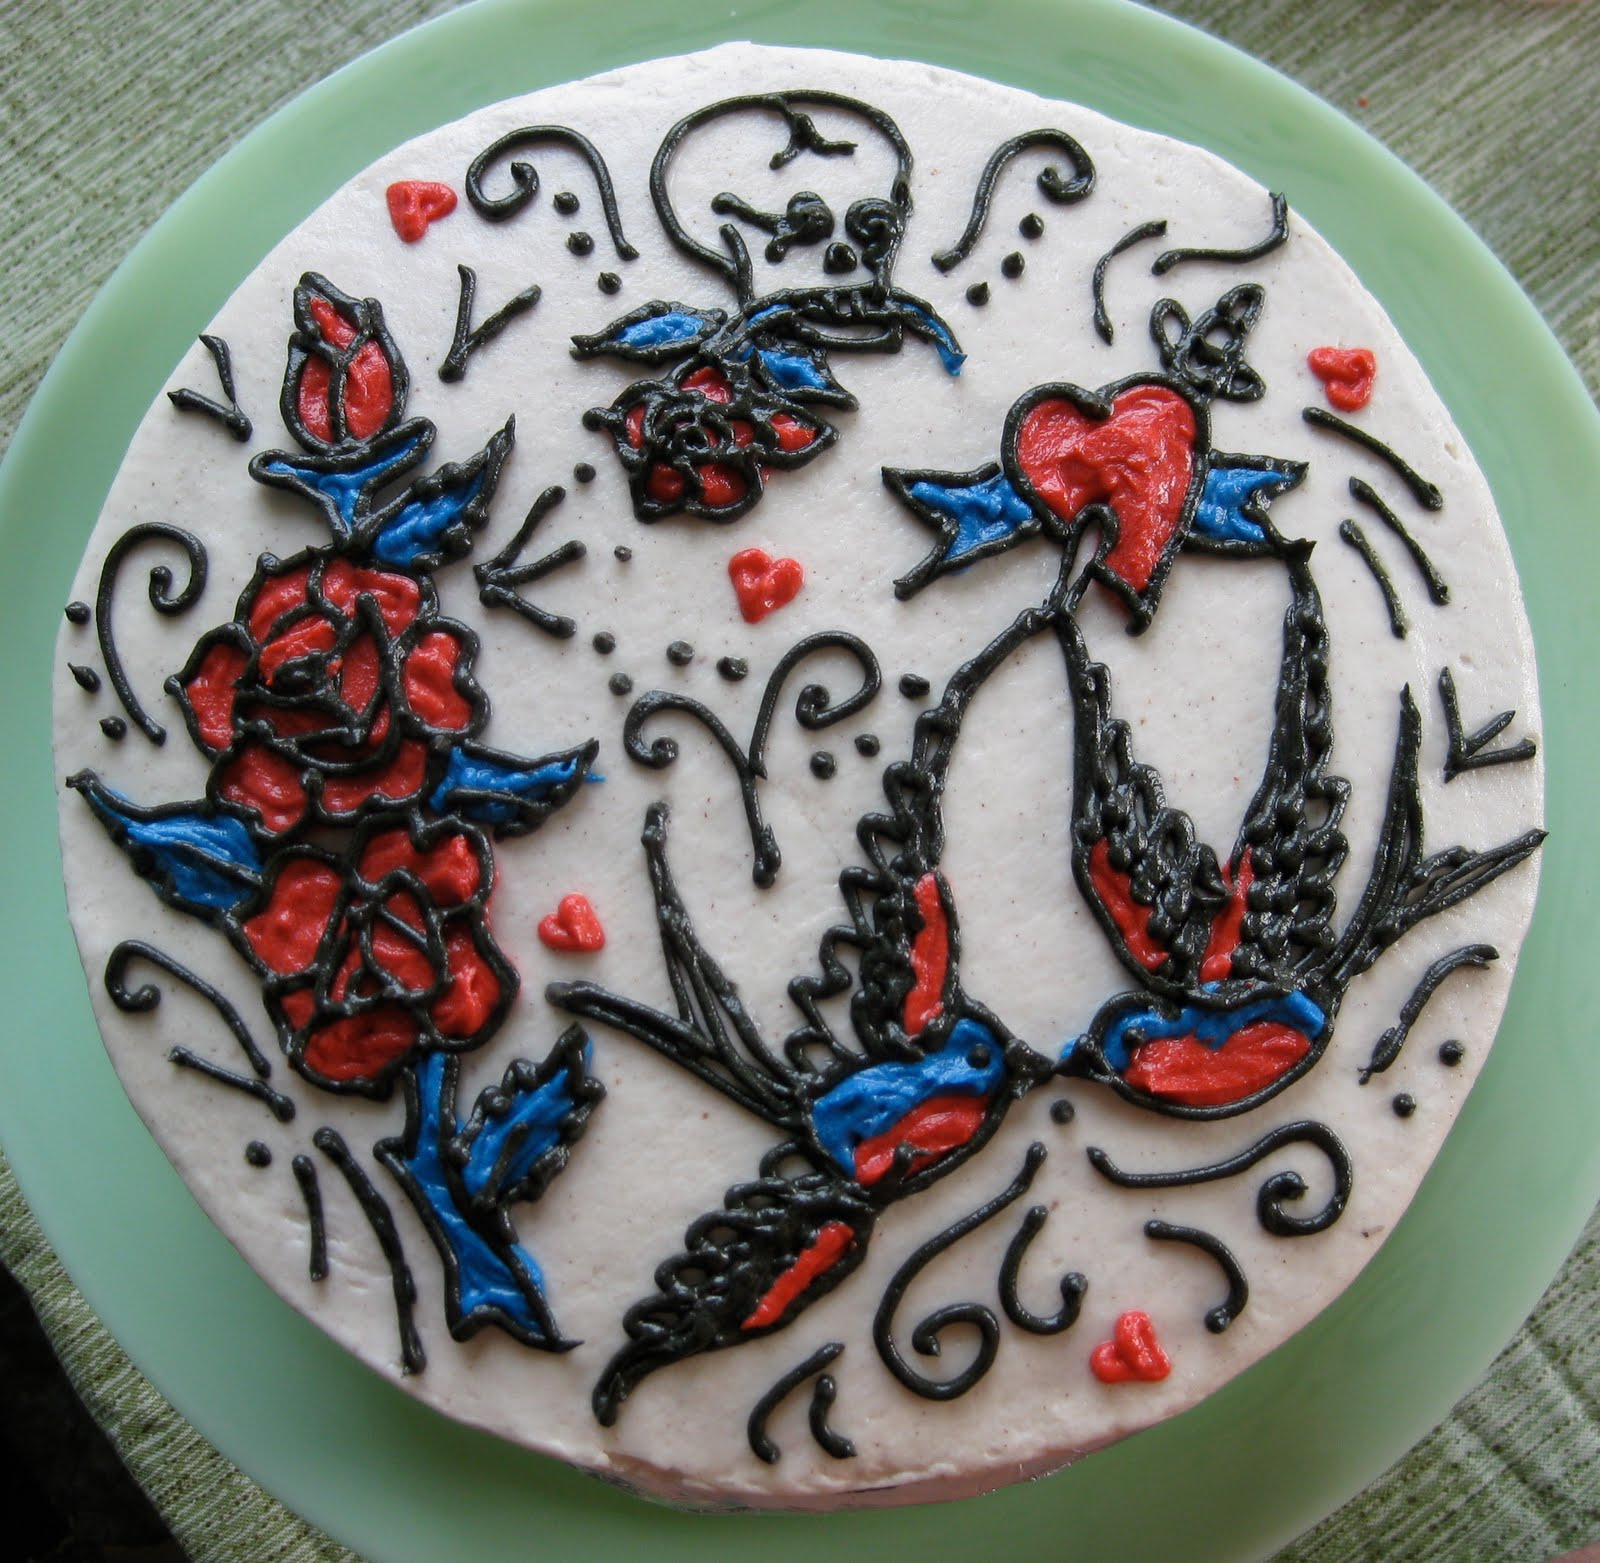 Stuffed Cakes: Retro Tattoo Cake & M&M Cupcakes